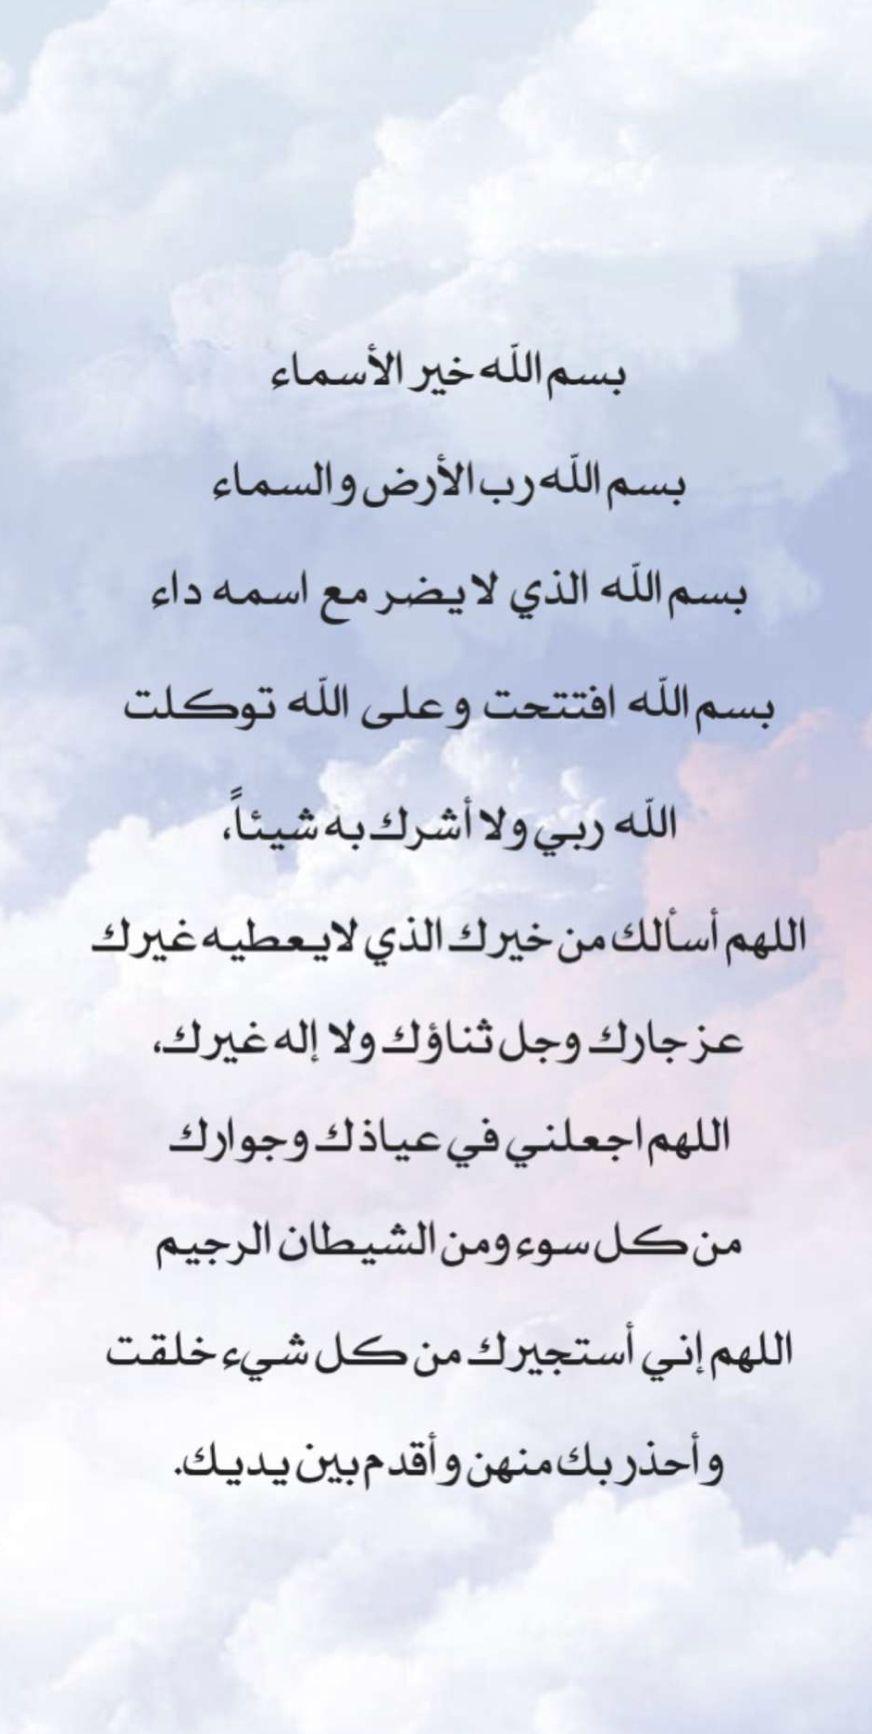 Pin By Shahad On كتابة على صور Islamic Inspirational Quotes Love Children Quotes Islamic Phrases